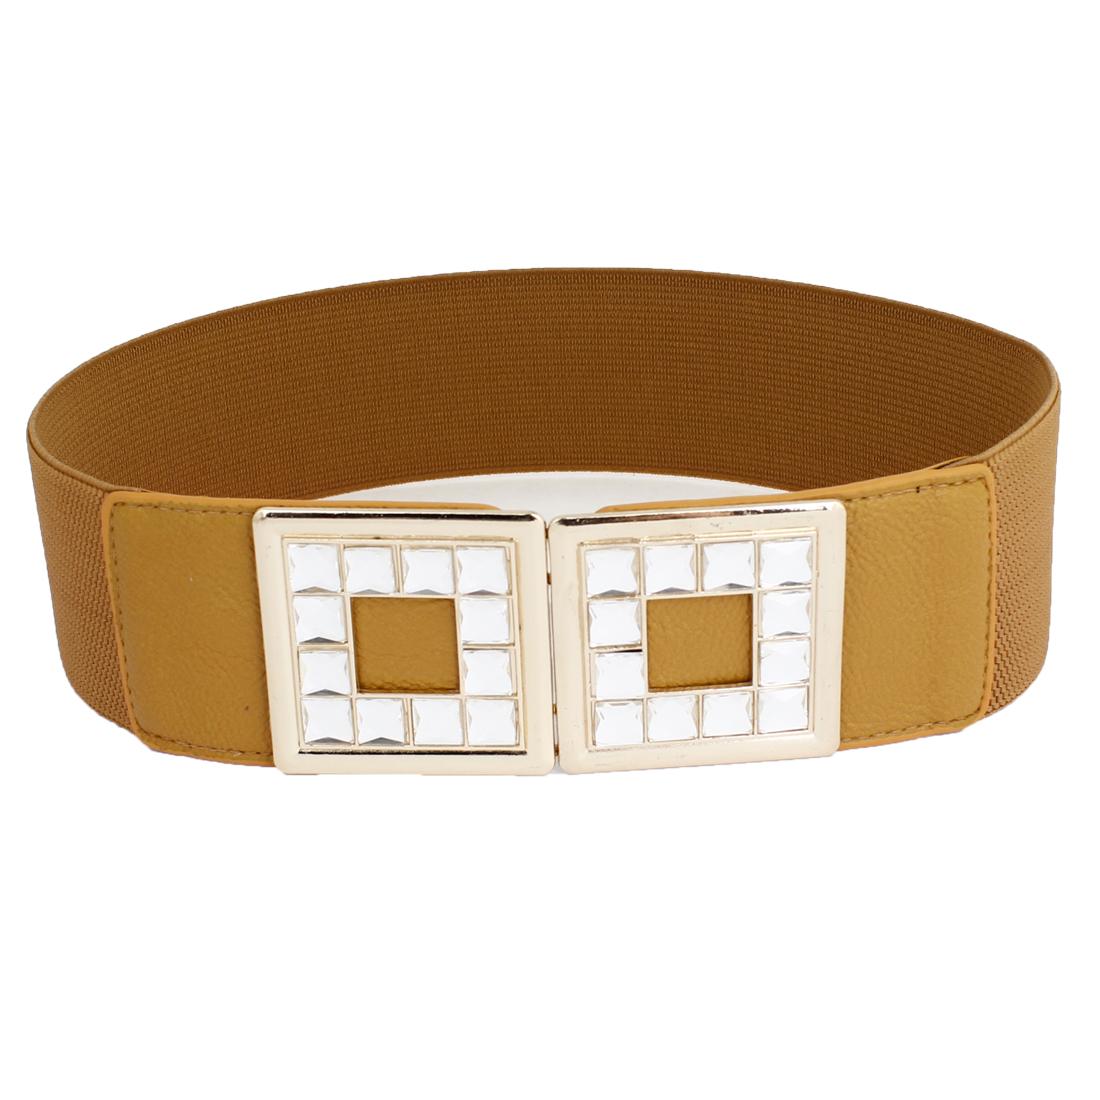 Faux Crystal Decor Interlocking Buckle 6cm Width Cinch Waist Belt Brown for Lady